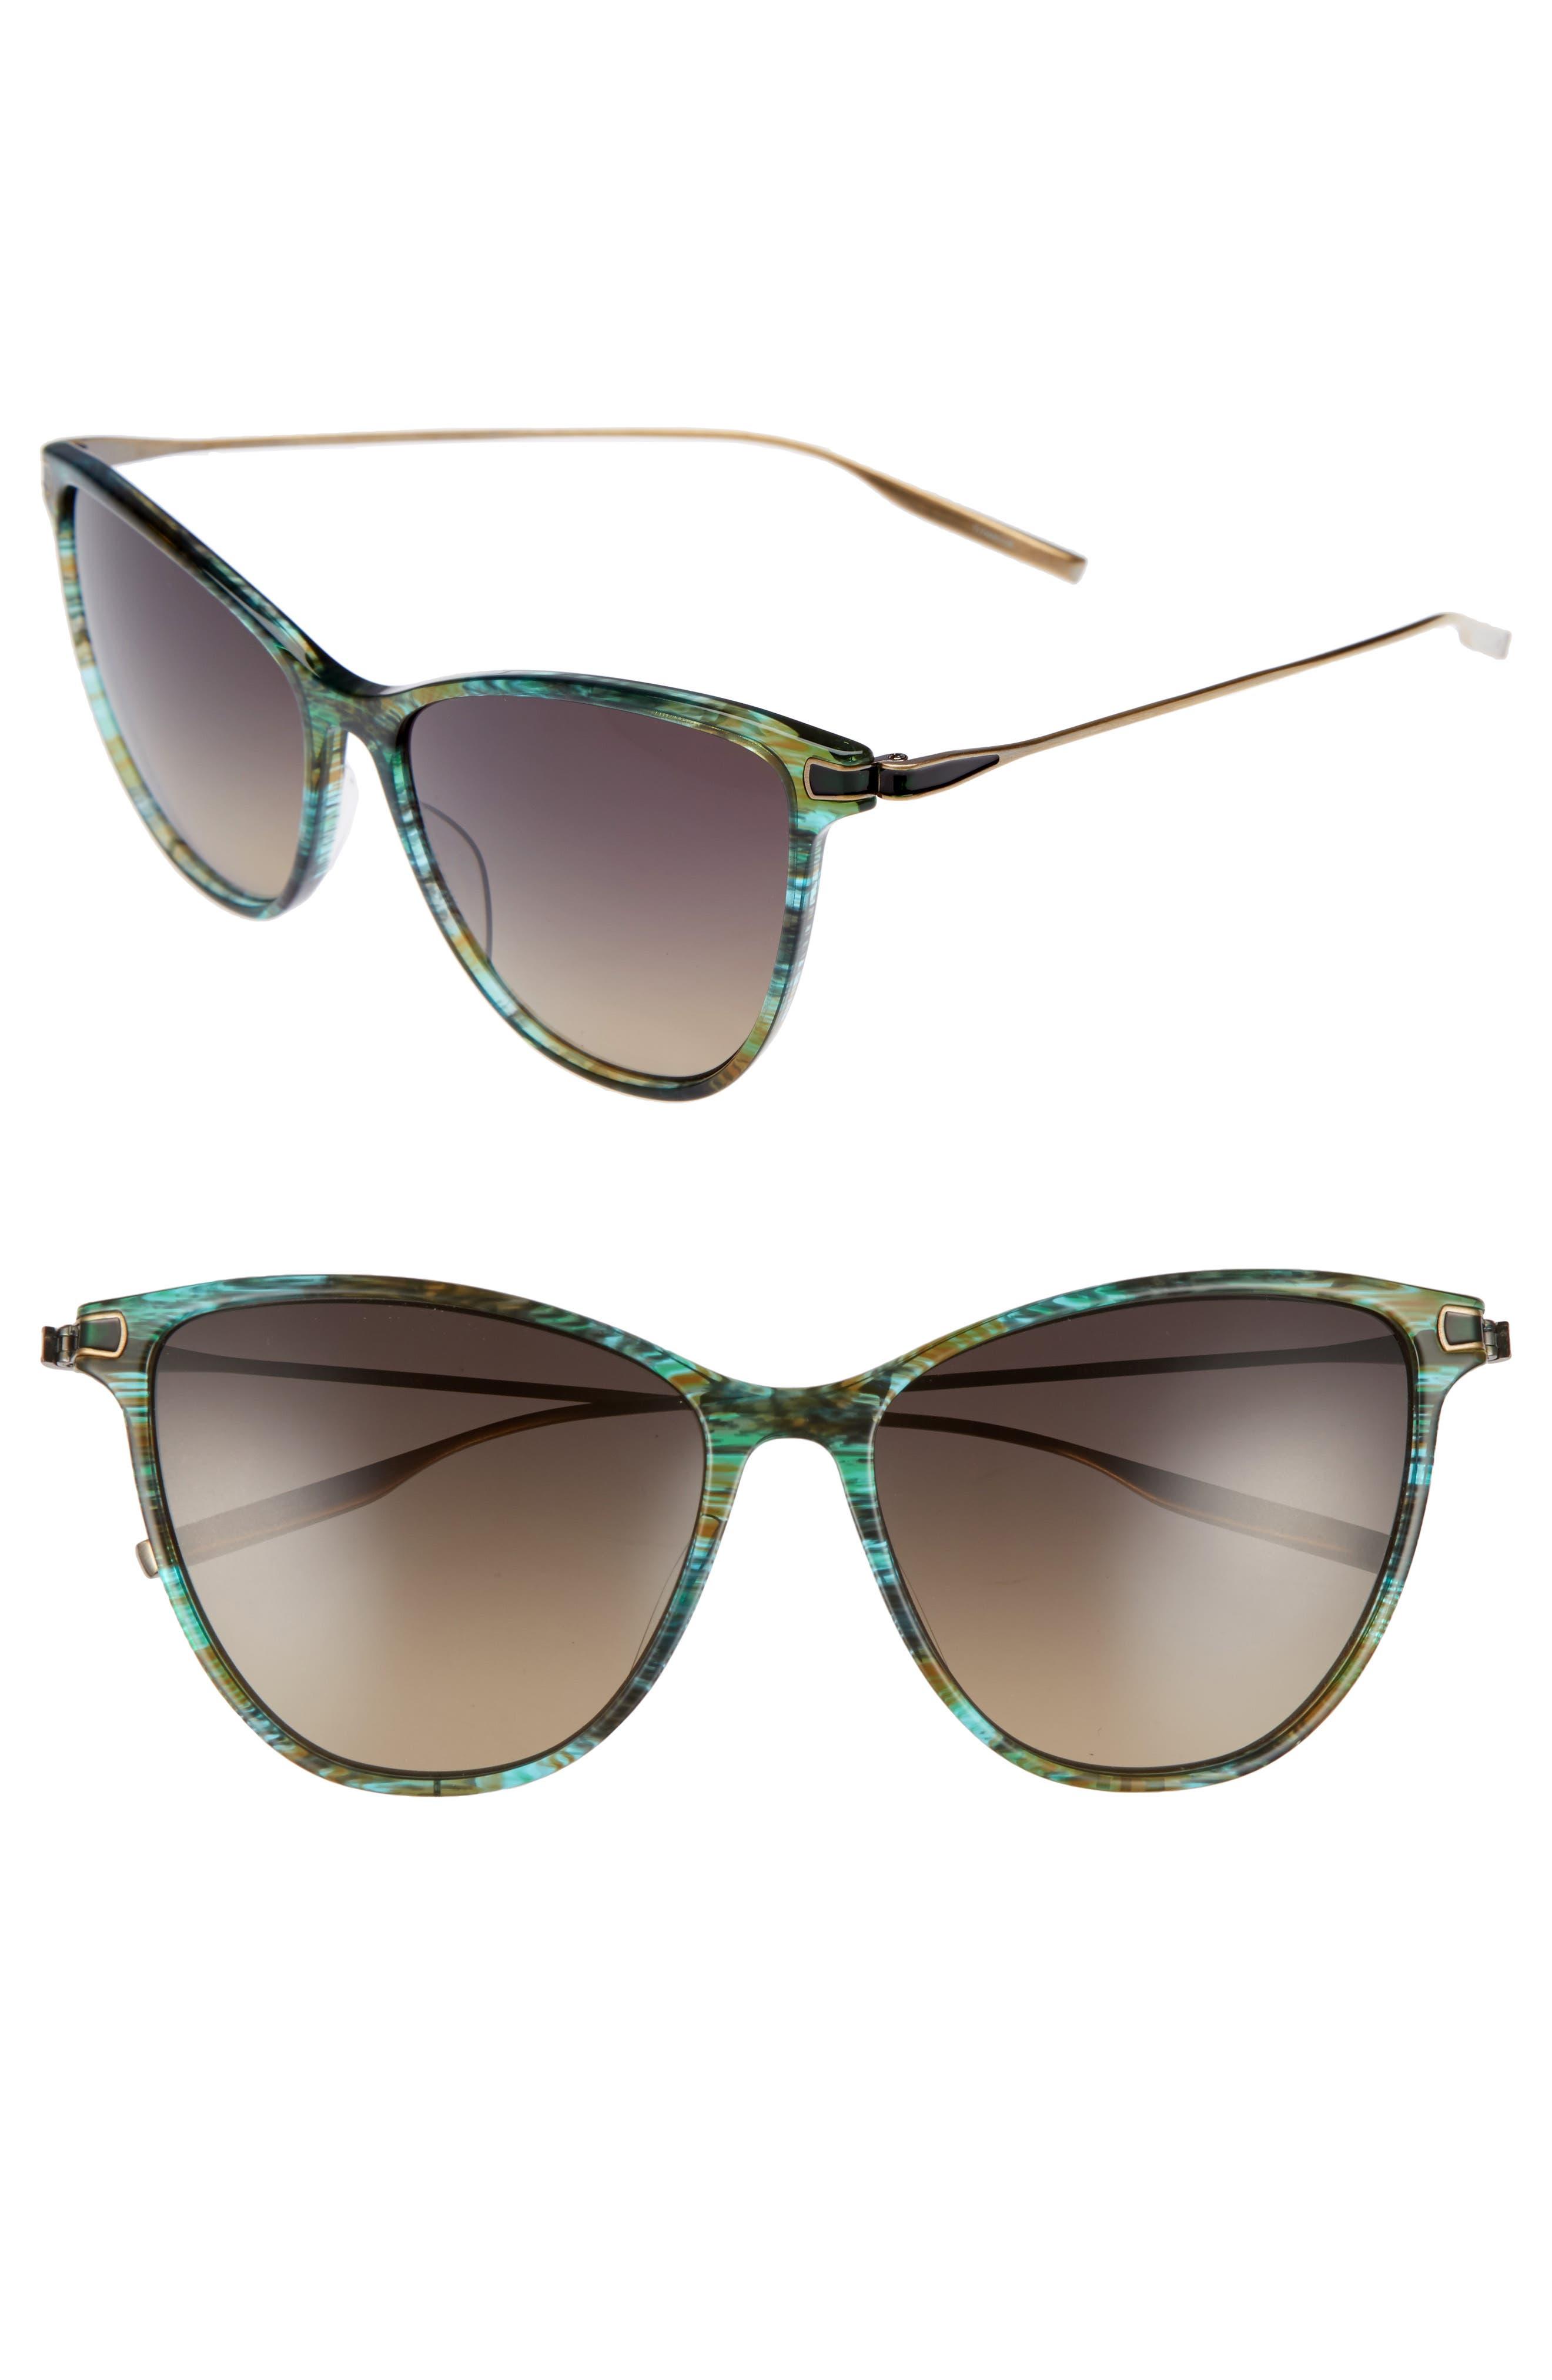 Main Image - Salt 58mm Polarized Cat Eye Sunglasses